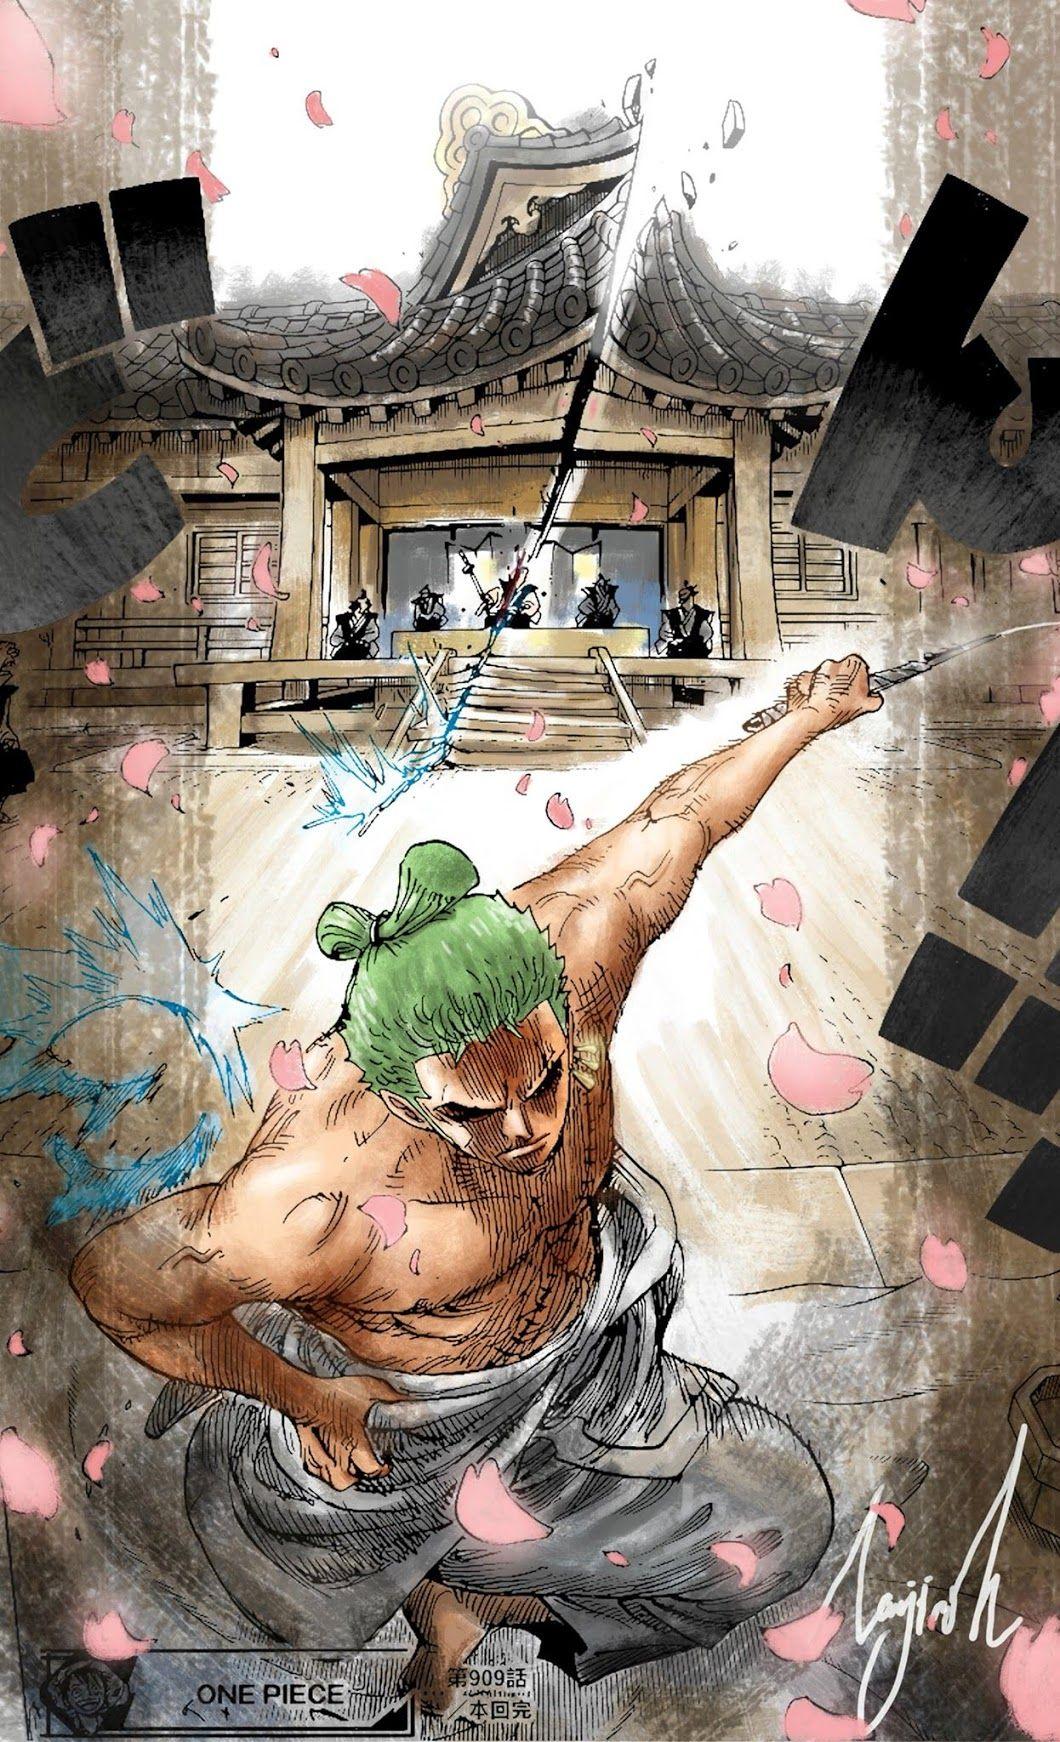 Epingle Par Gabriel Sierra Sur Anime Manga Celebre Dessin One Piece Fond D Ecran Telephone Manga